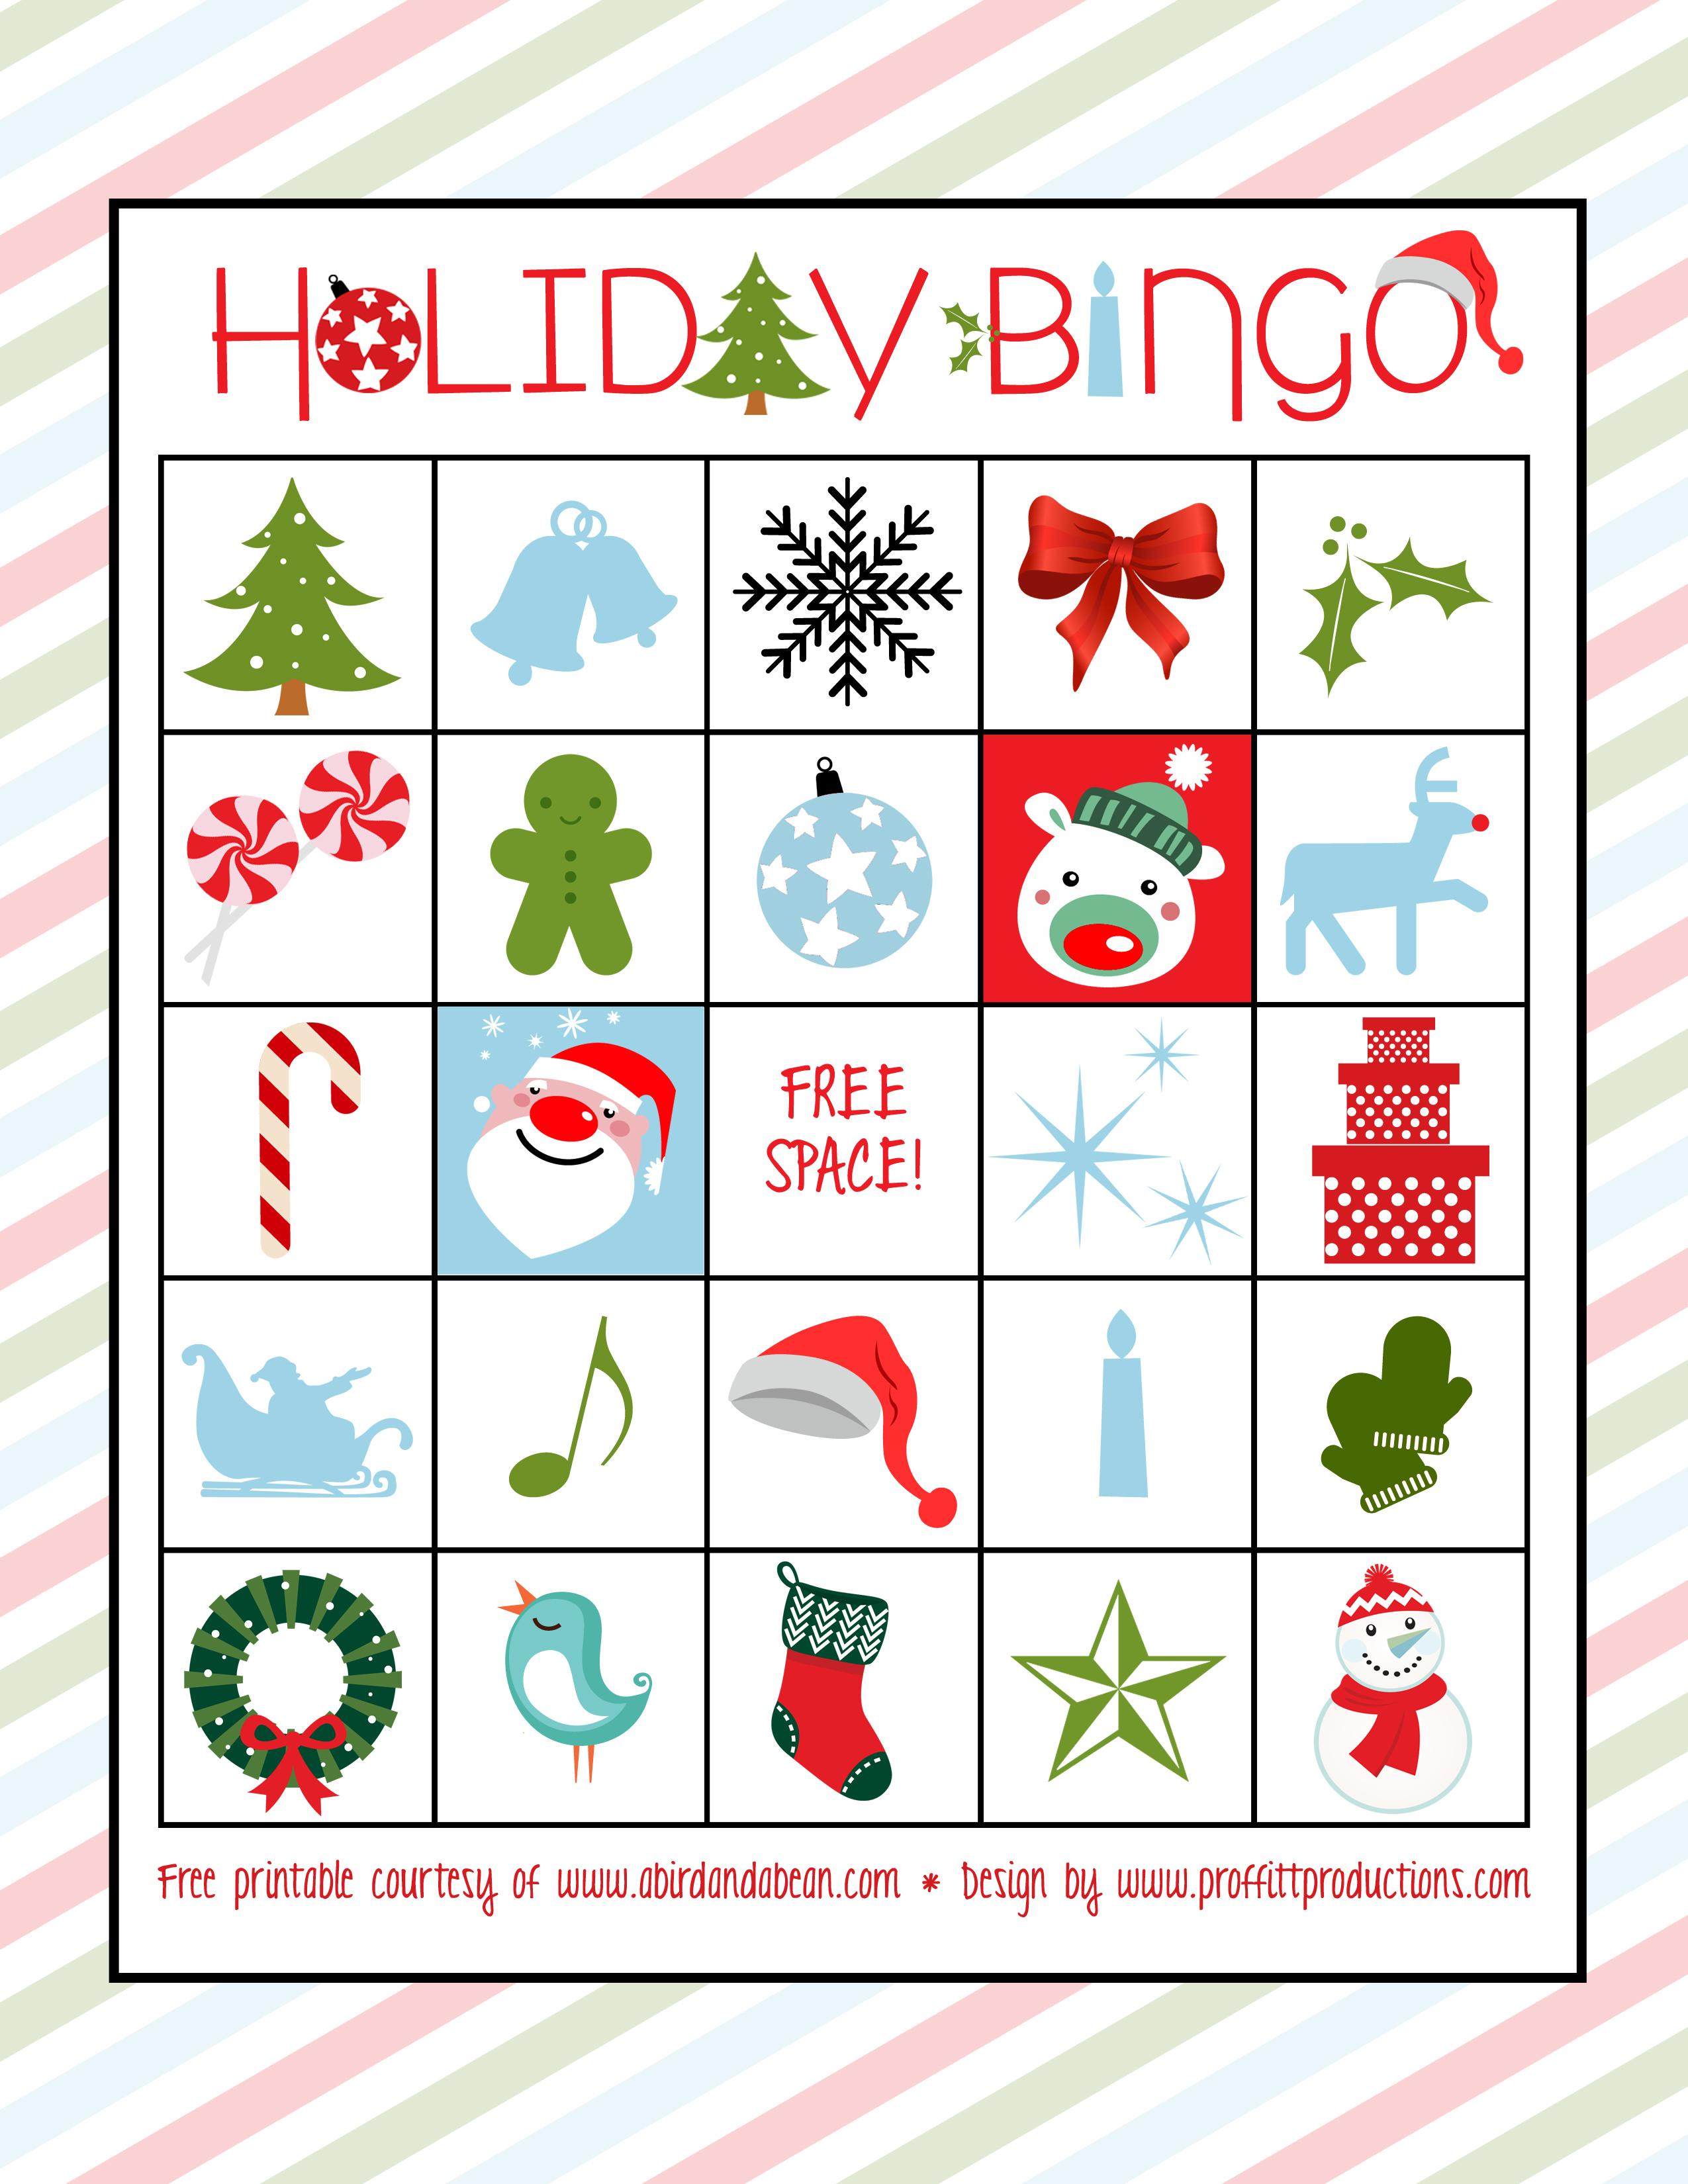 Bingo Clipart Holiday Bingo Holiday Transparent Free For